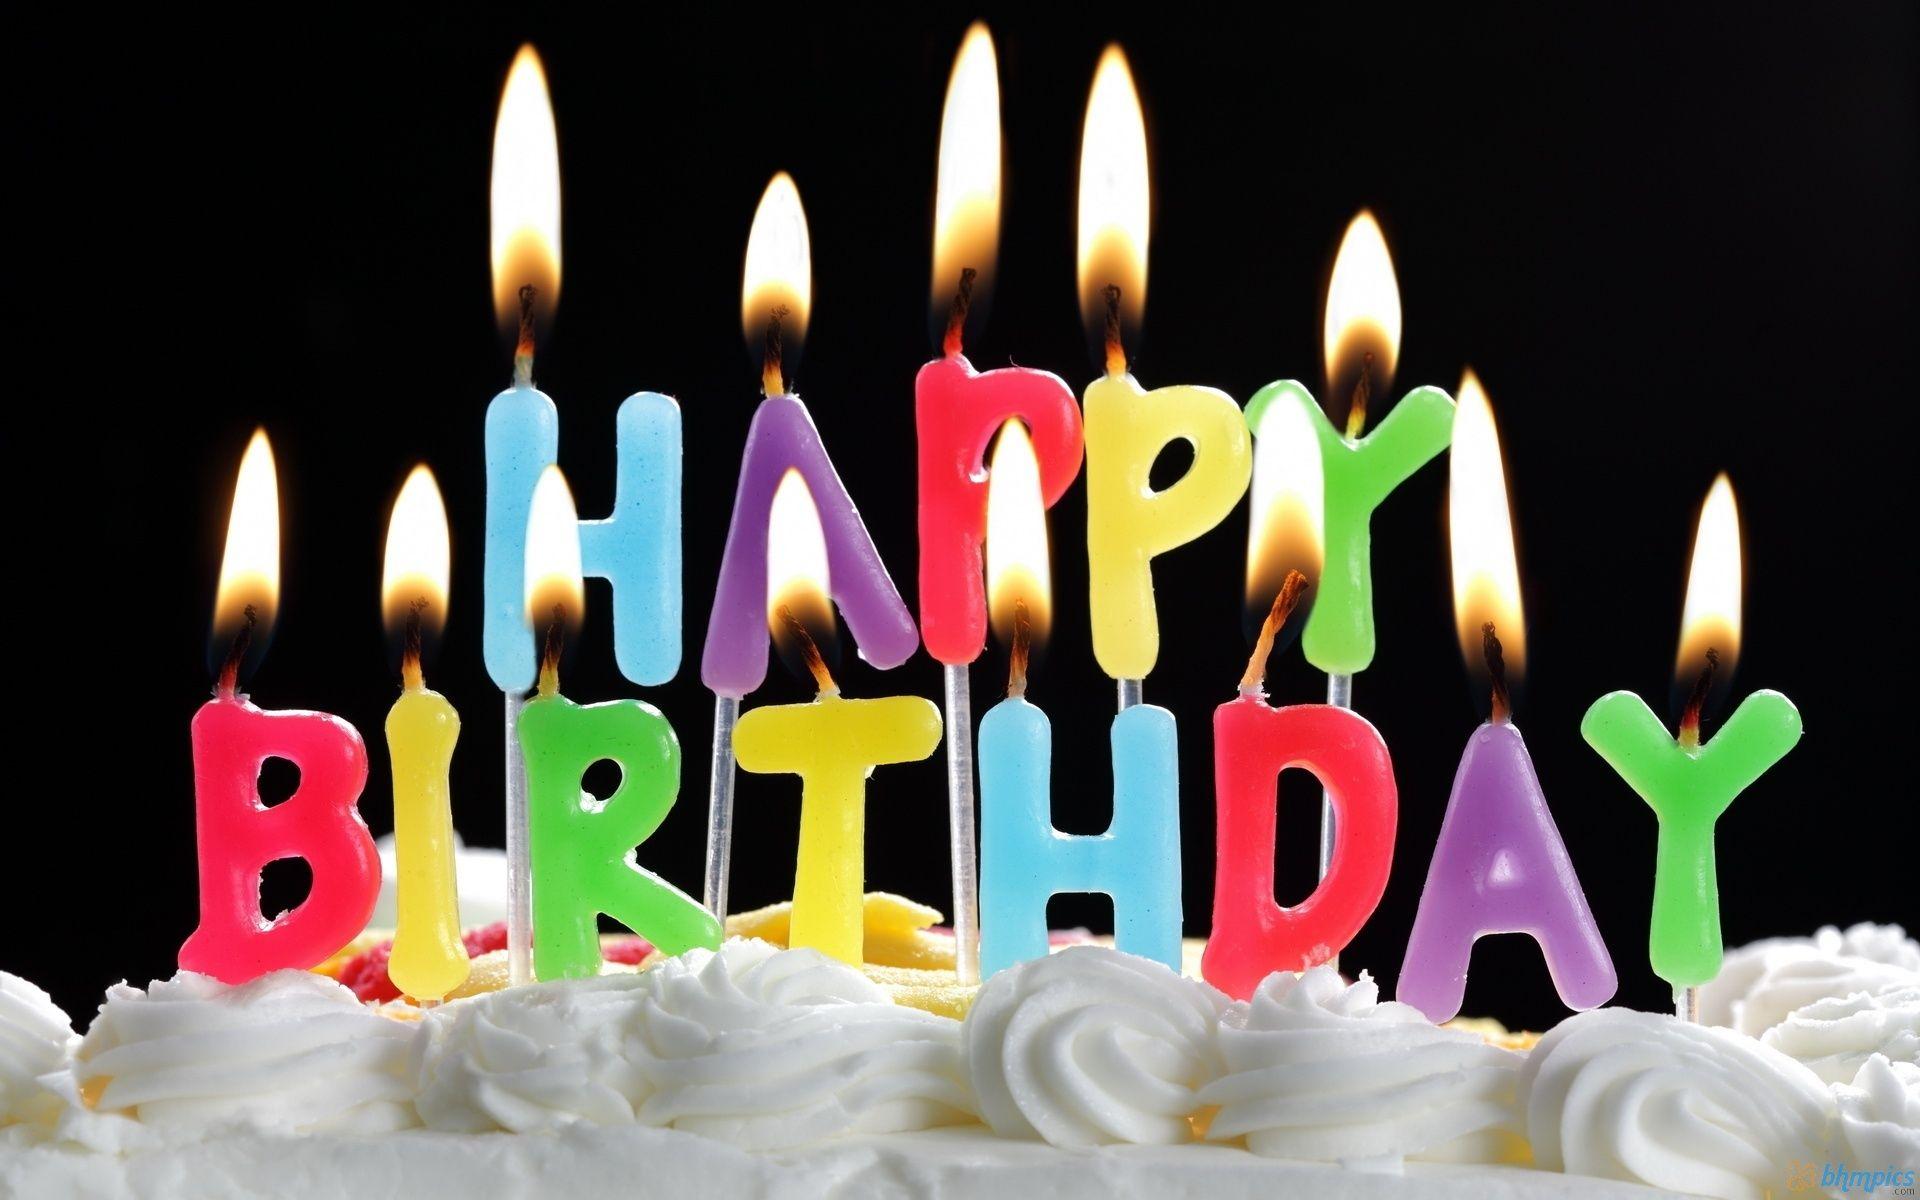 Stupendous My Birthday Brings All The Marketers To The Yard Happy Birthday Funny Birthday Cards Online Elaedamsfinfo